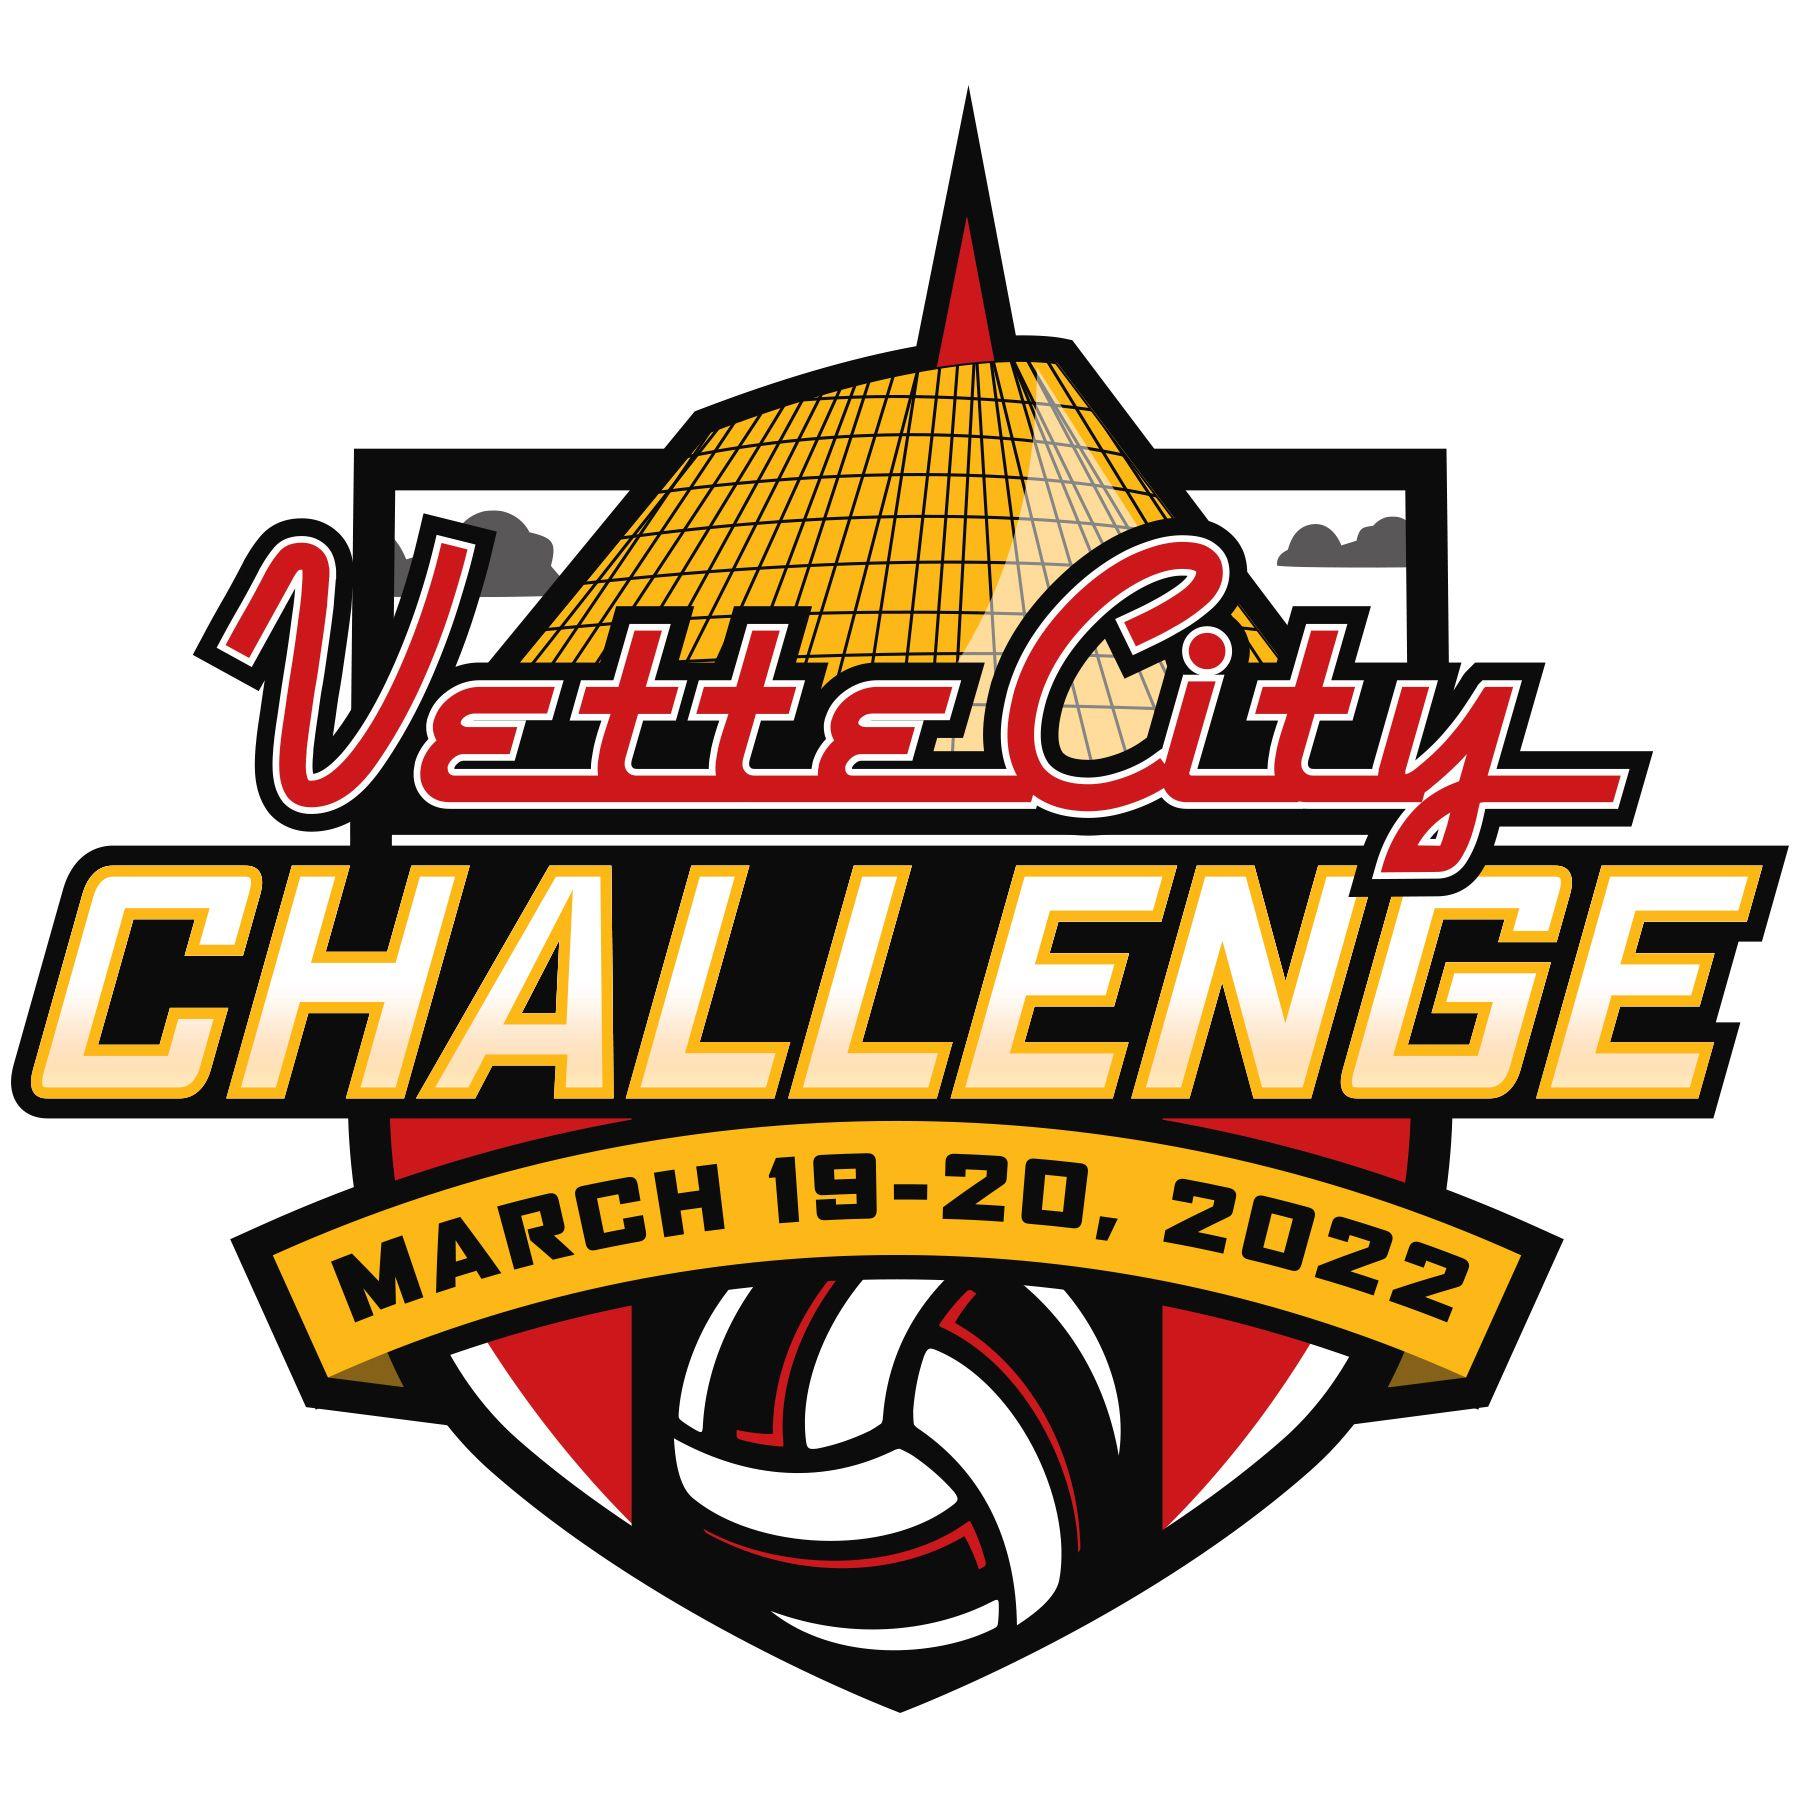 Vette City Challenge